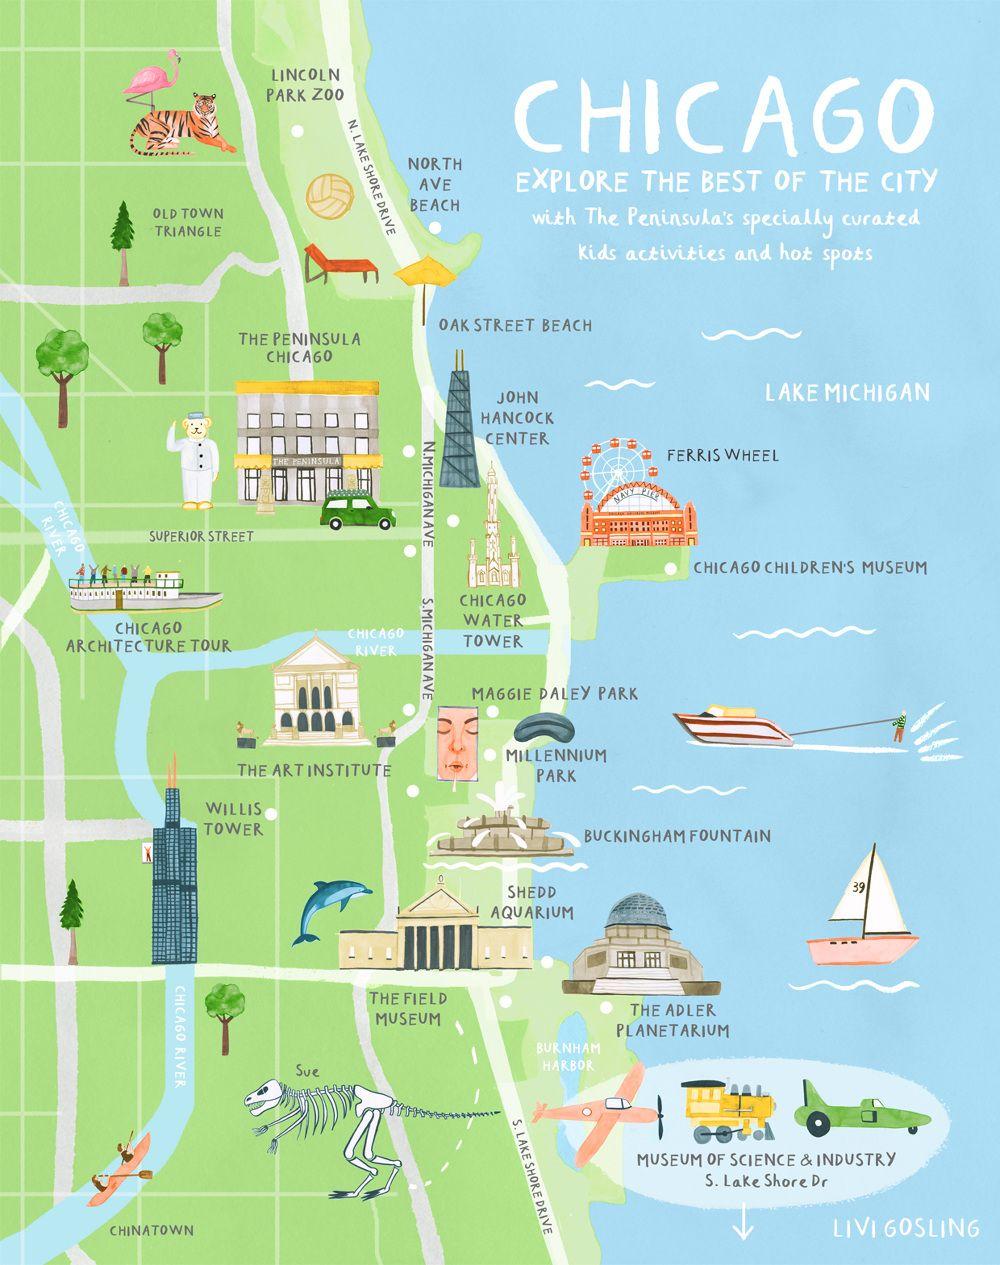 Chicago Illustration. Australian Traveller - Livi Gosling - Map Of Chicago Attractions Printable